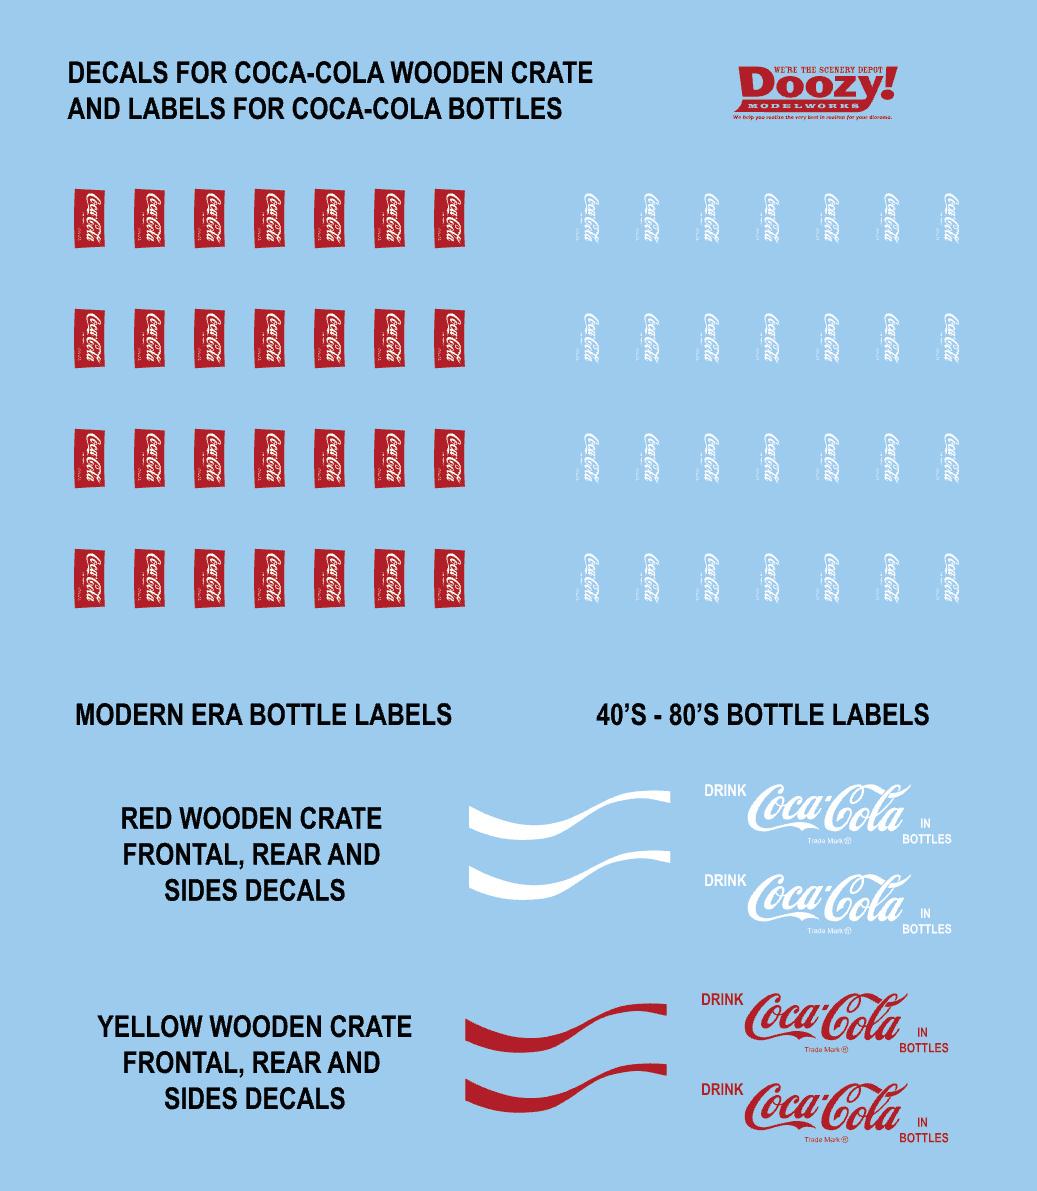 Doozy 1940-1980's WOODEN BOX COCA-COLA BOTTLES - Scale 1/24 - Doozy - DZ026